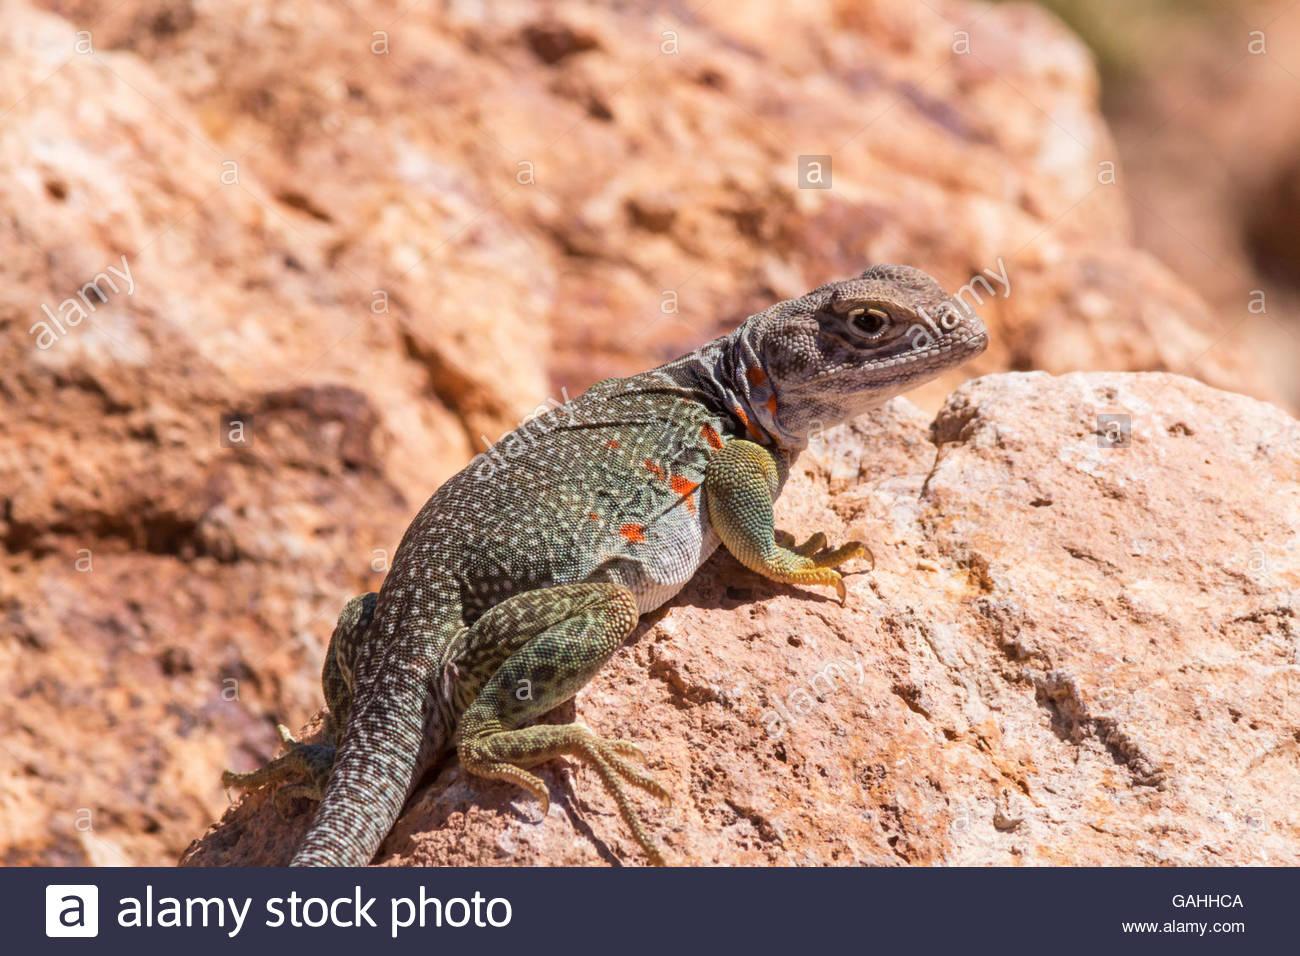 Eastern Collared Lizard (Crotaphytus collaris) - Reptiles of Arizona